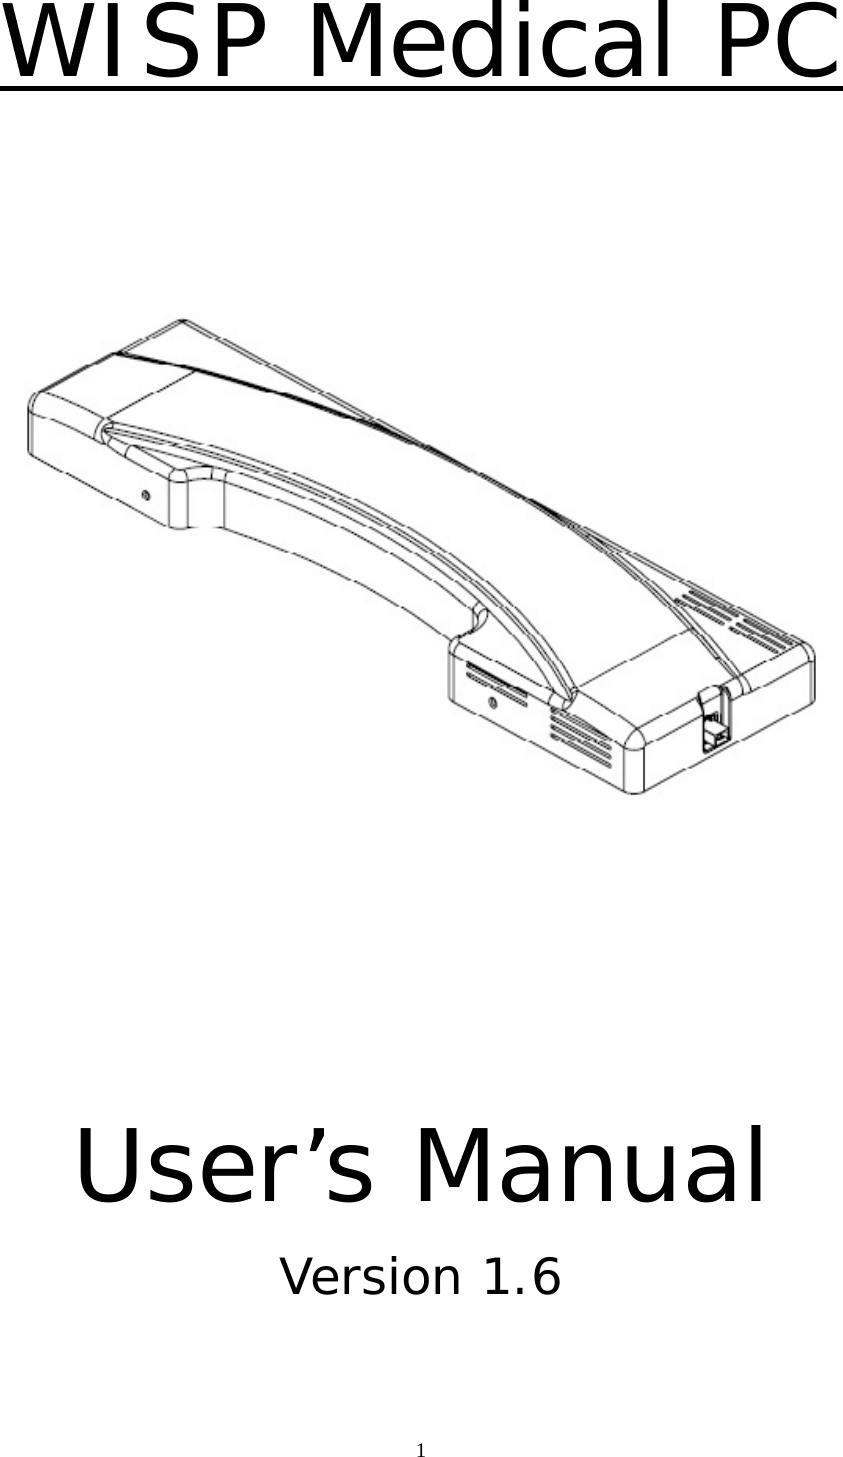 Portwell WISP5 Wireless Service Platform User Manual WISP